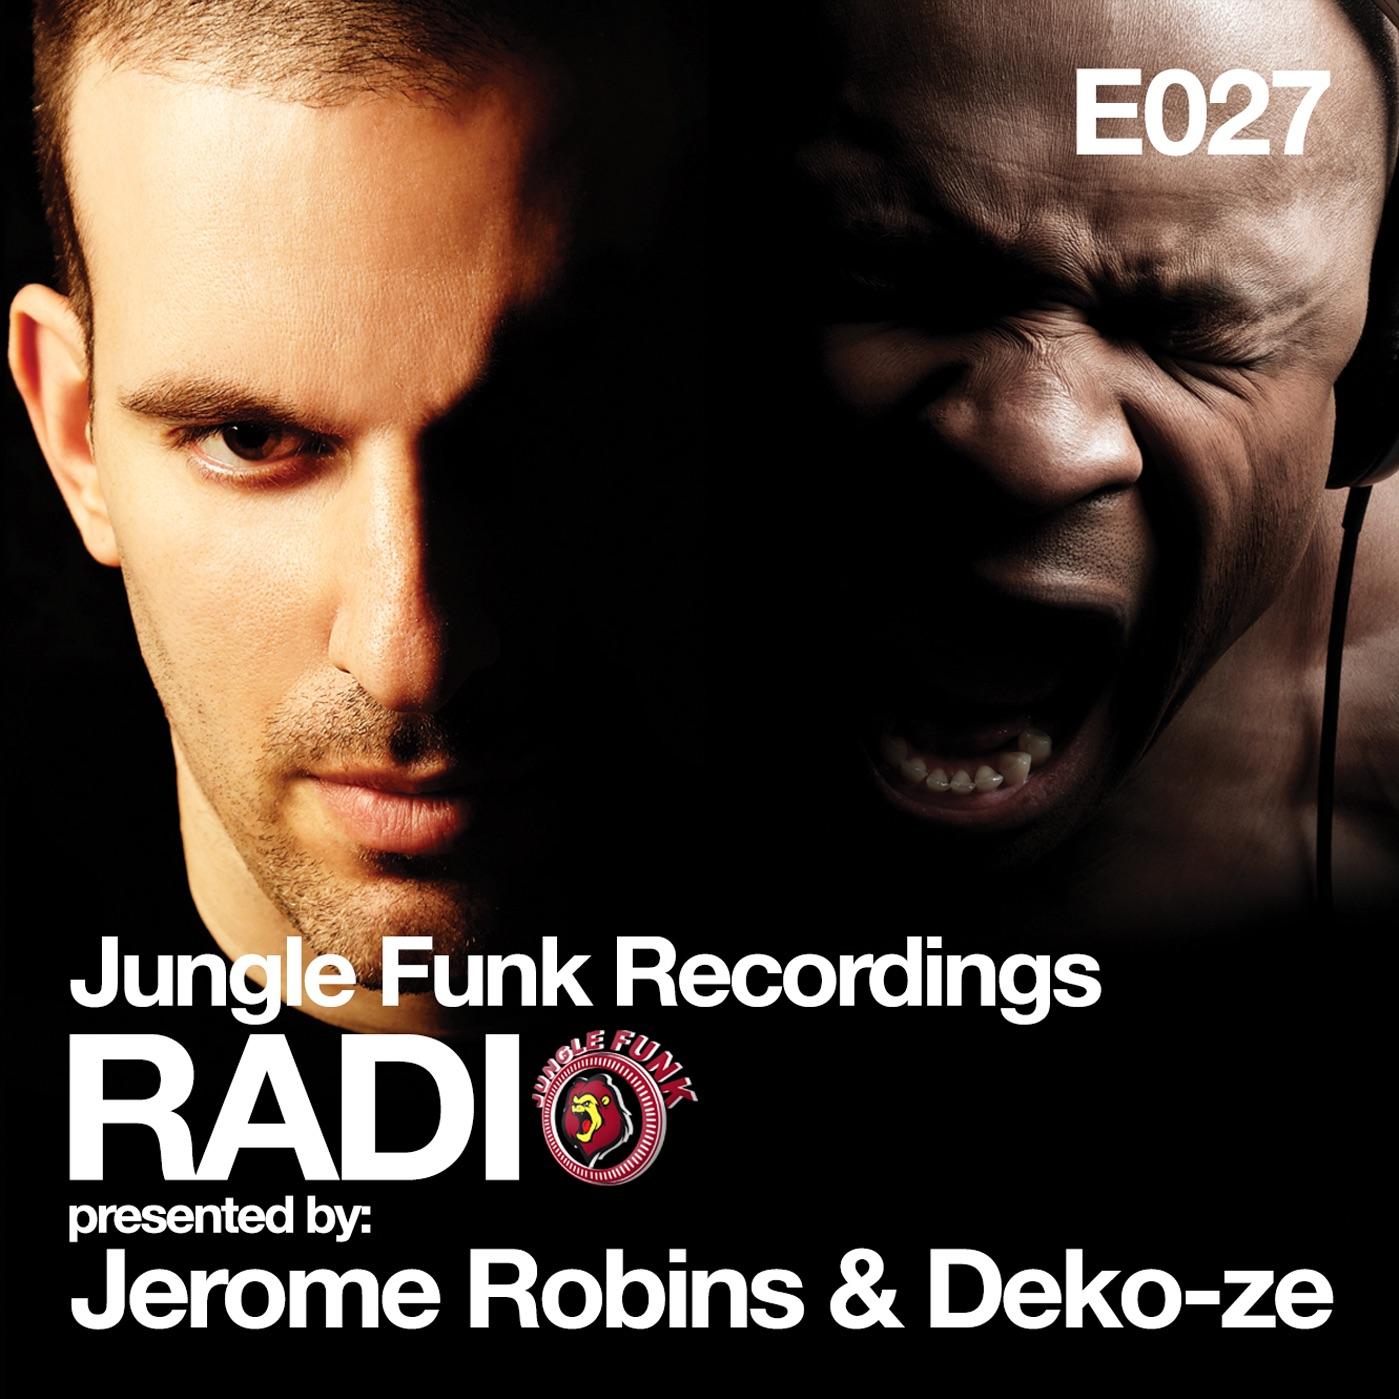 Jungle Funk Recordings Podcast Episode 027